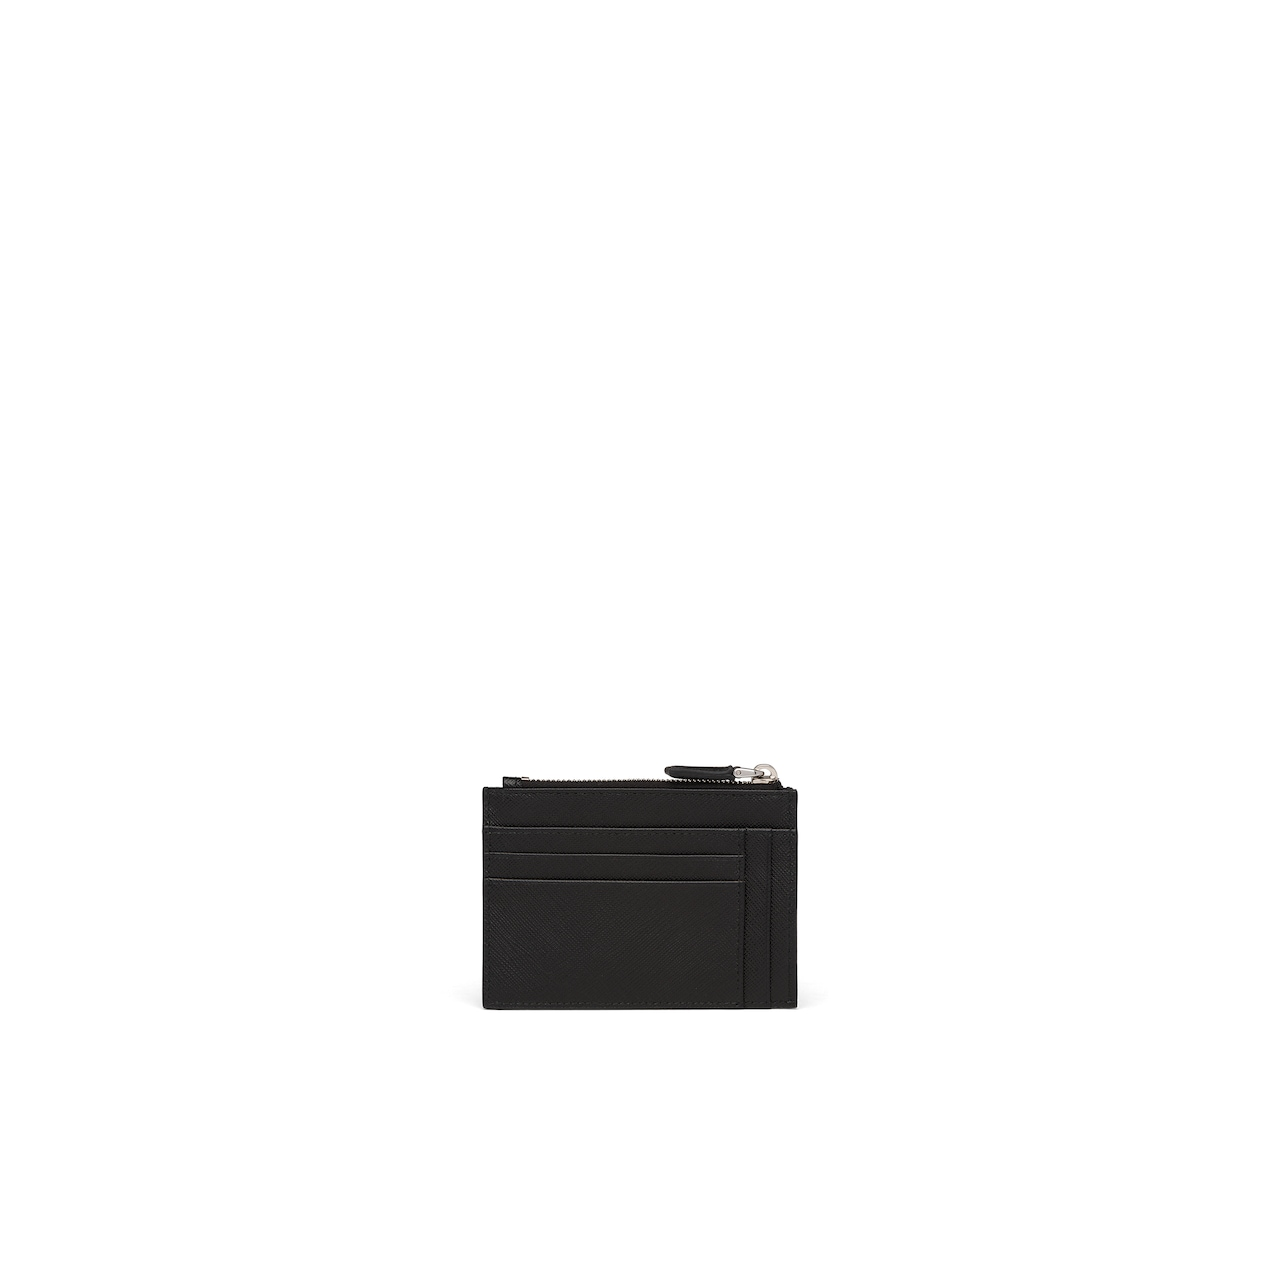 Prada Saffiano 皮革卡片夹 3